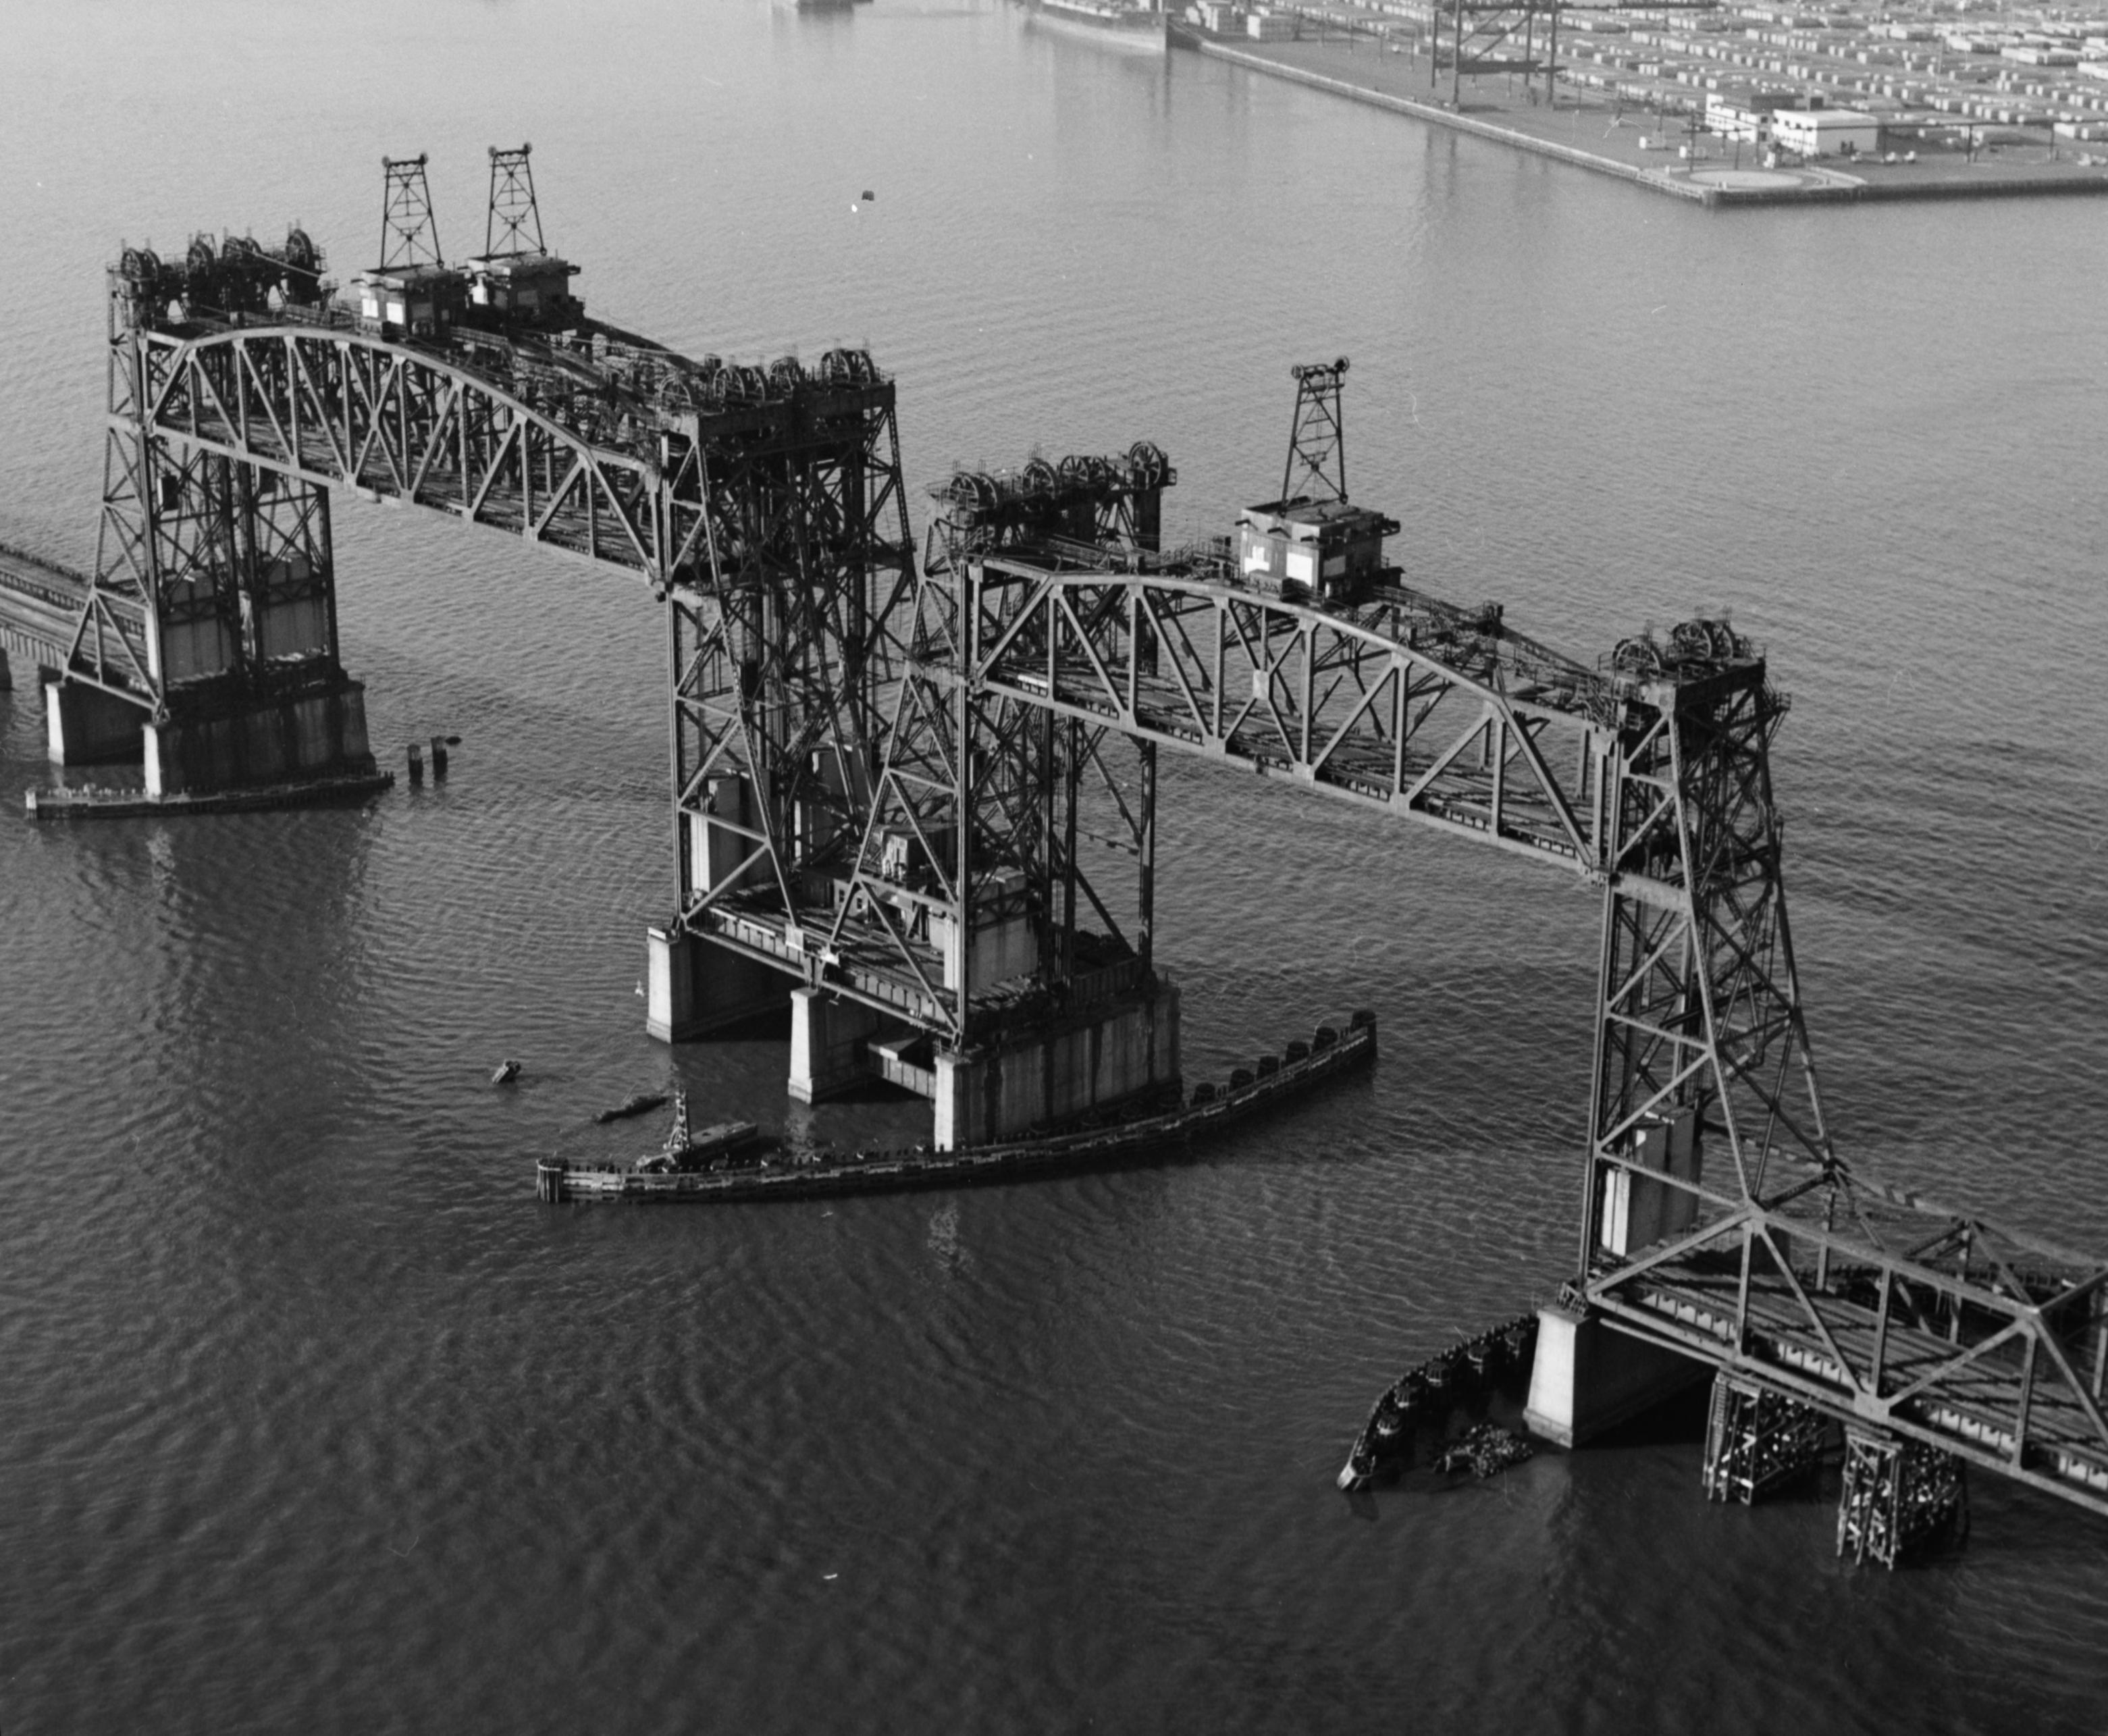 Newark Bay Bridge in upright position. Photo: wiki